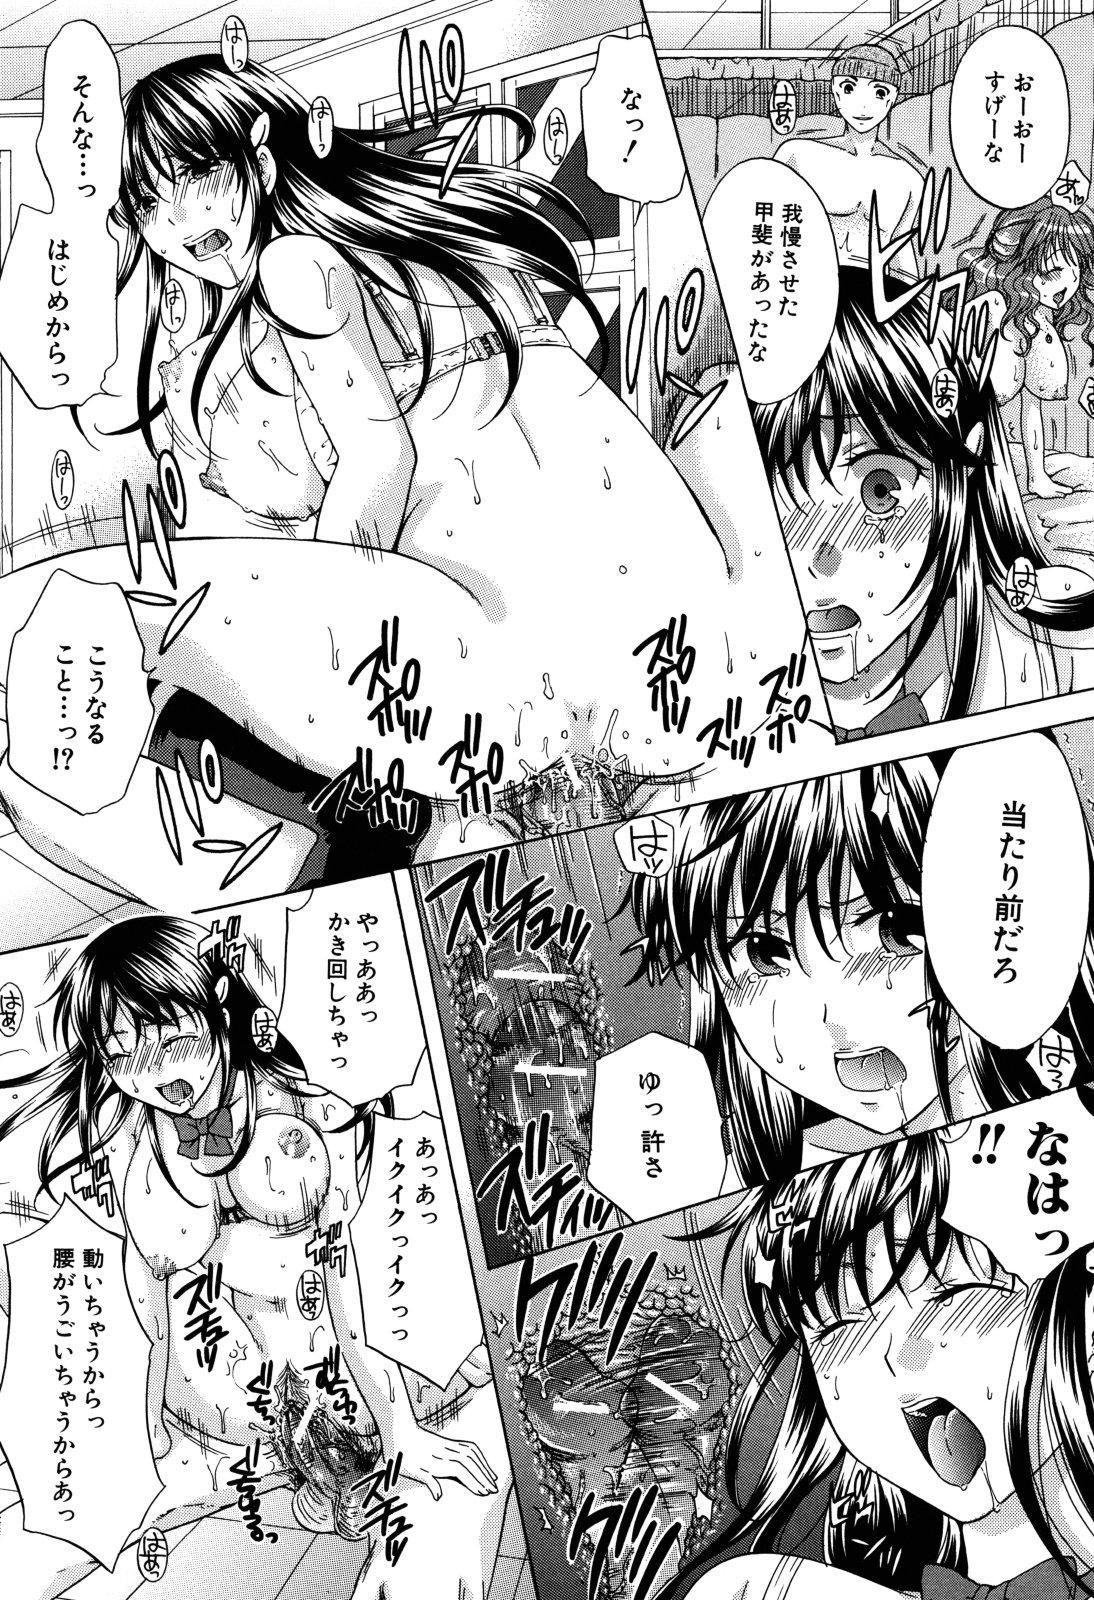 Kanojo ga Ochiru made - She in the depth 196